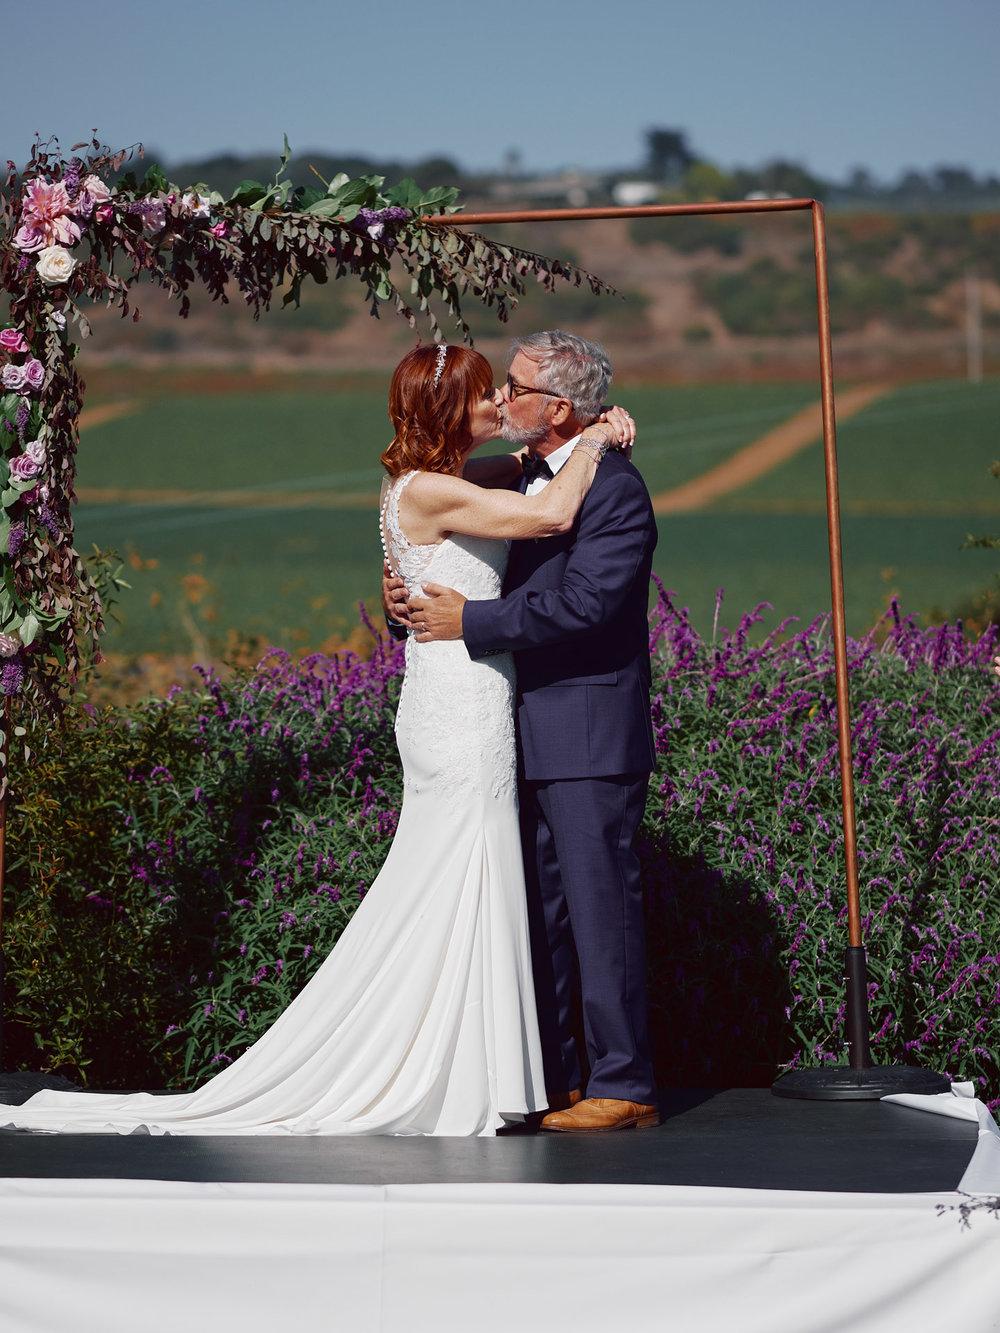 9-23-18 Suzanne and Chris Wedding - 00076.jpg